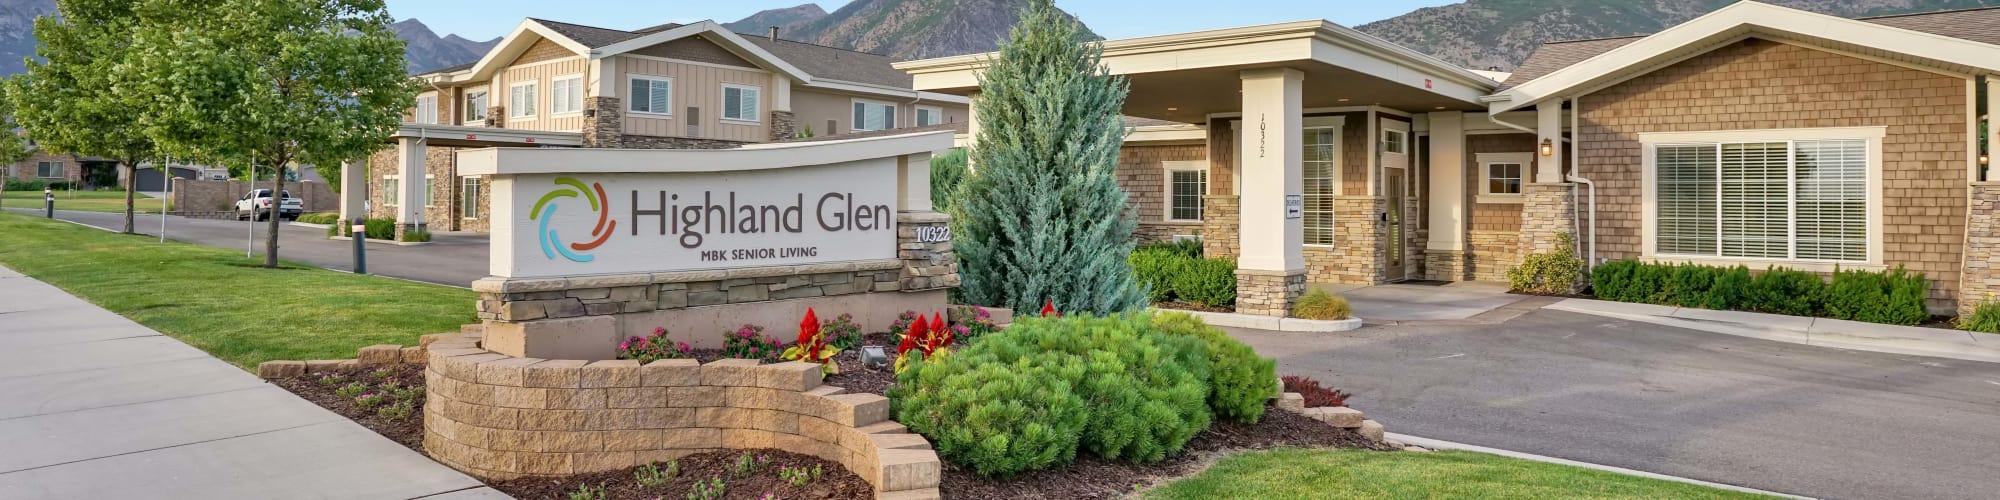 Schedule a Tour at Highland Glen in Highland, Utah